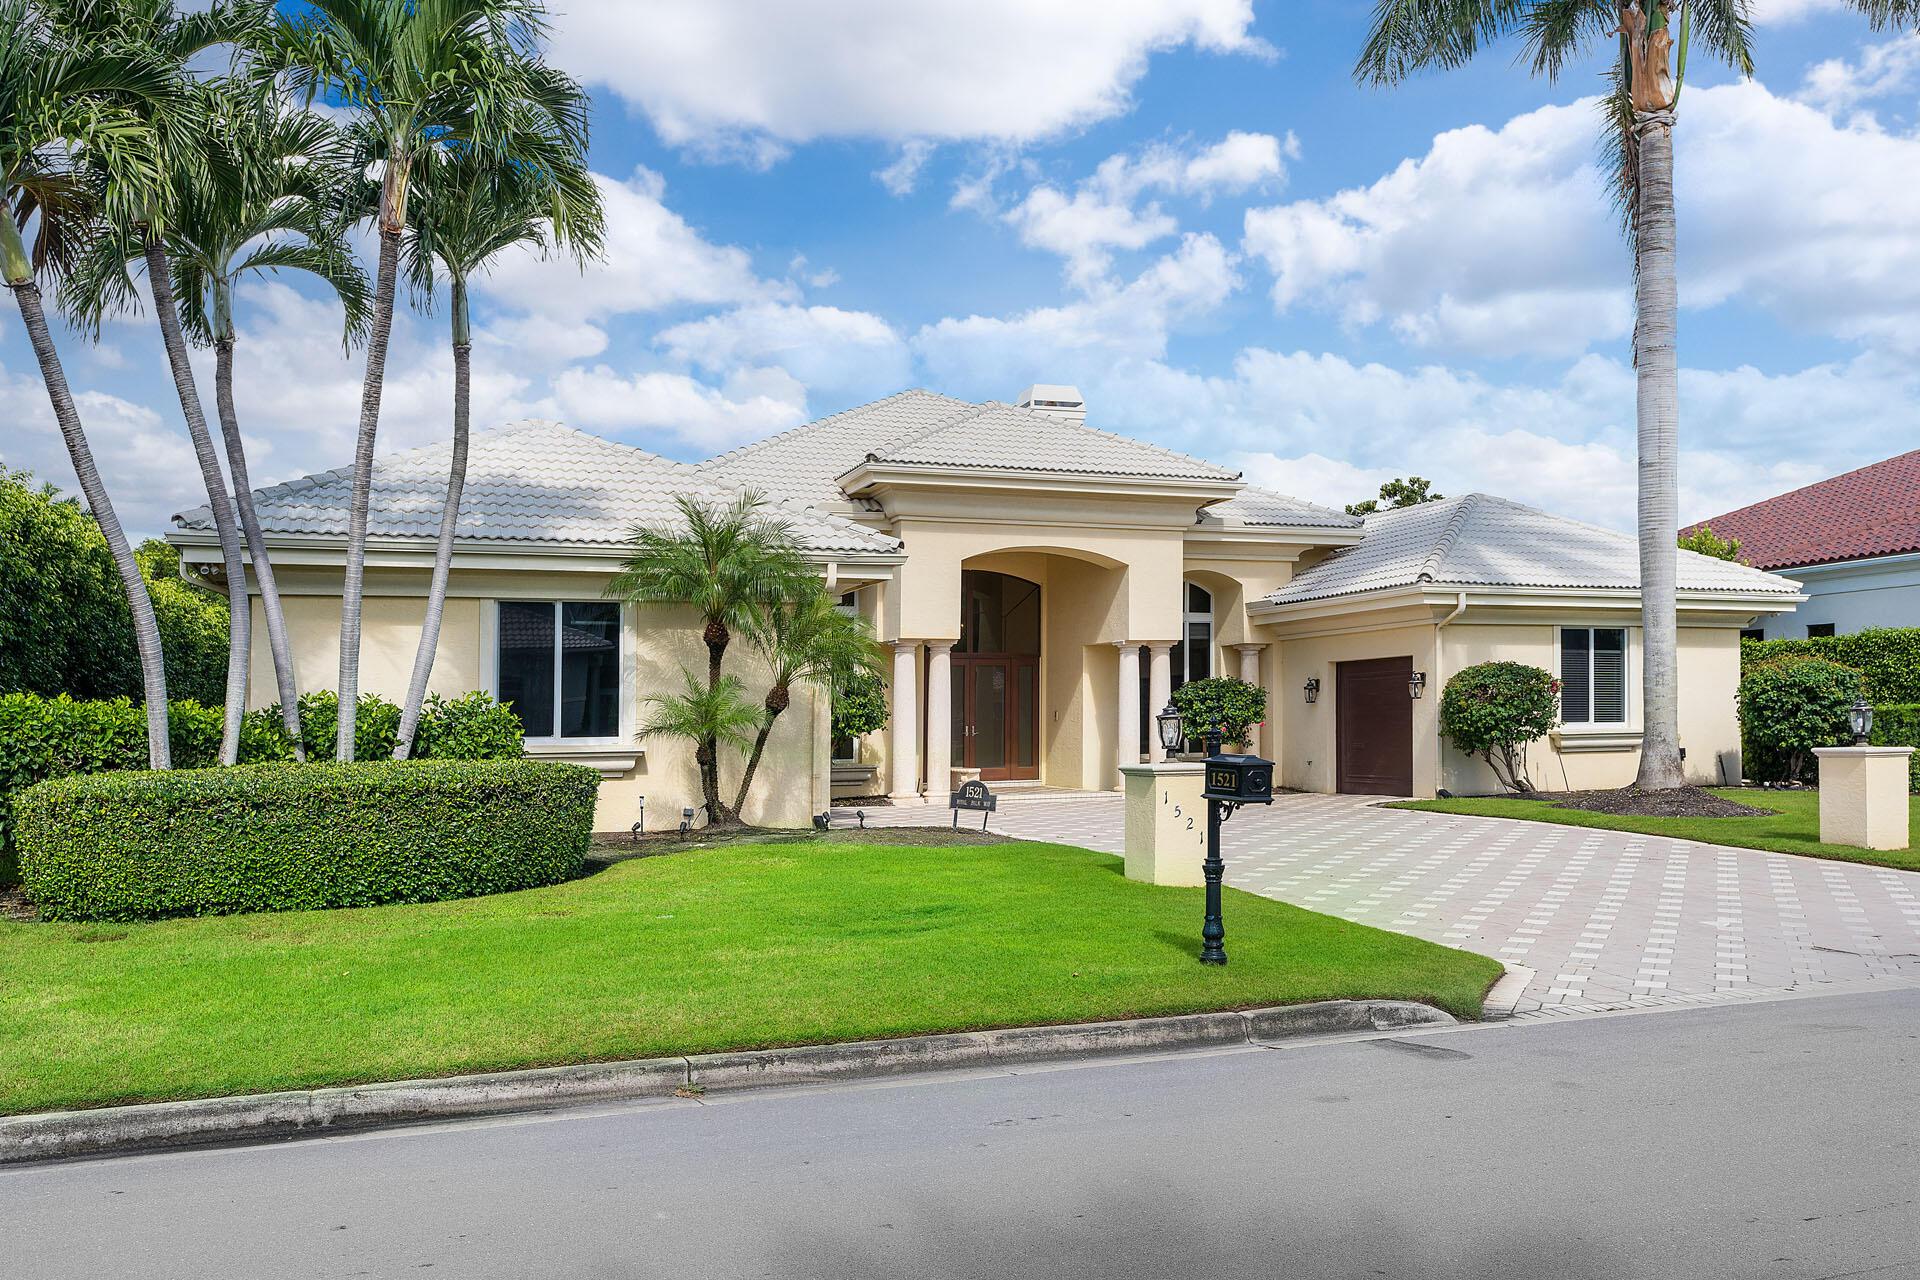 1521  Royal Palm Way  For Sale 10747410, FL